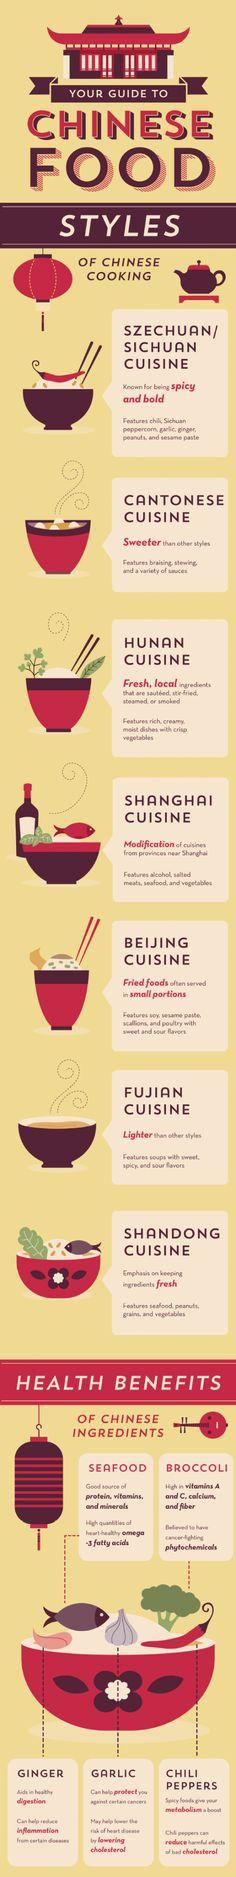 De keukens van China: van kantonees tot szechuan » Culy.nl